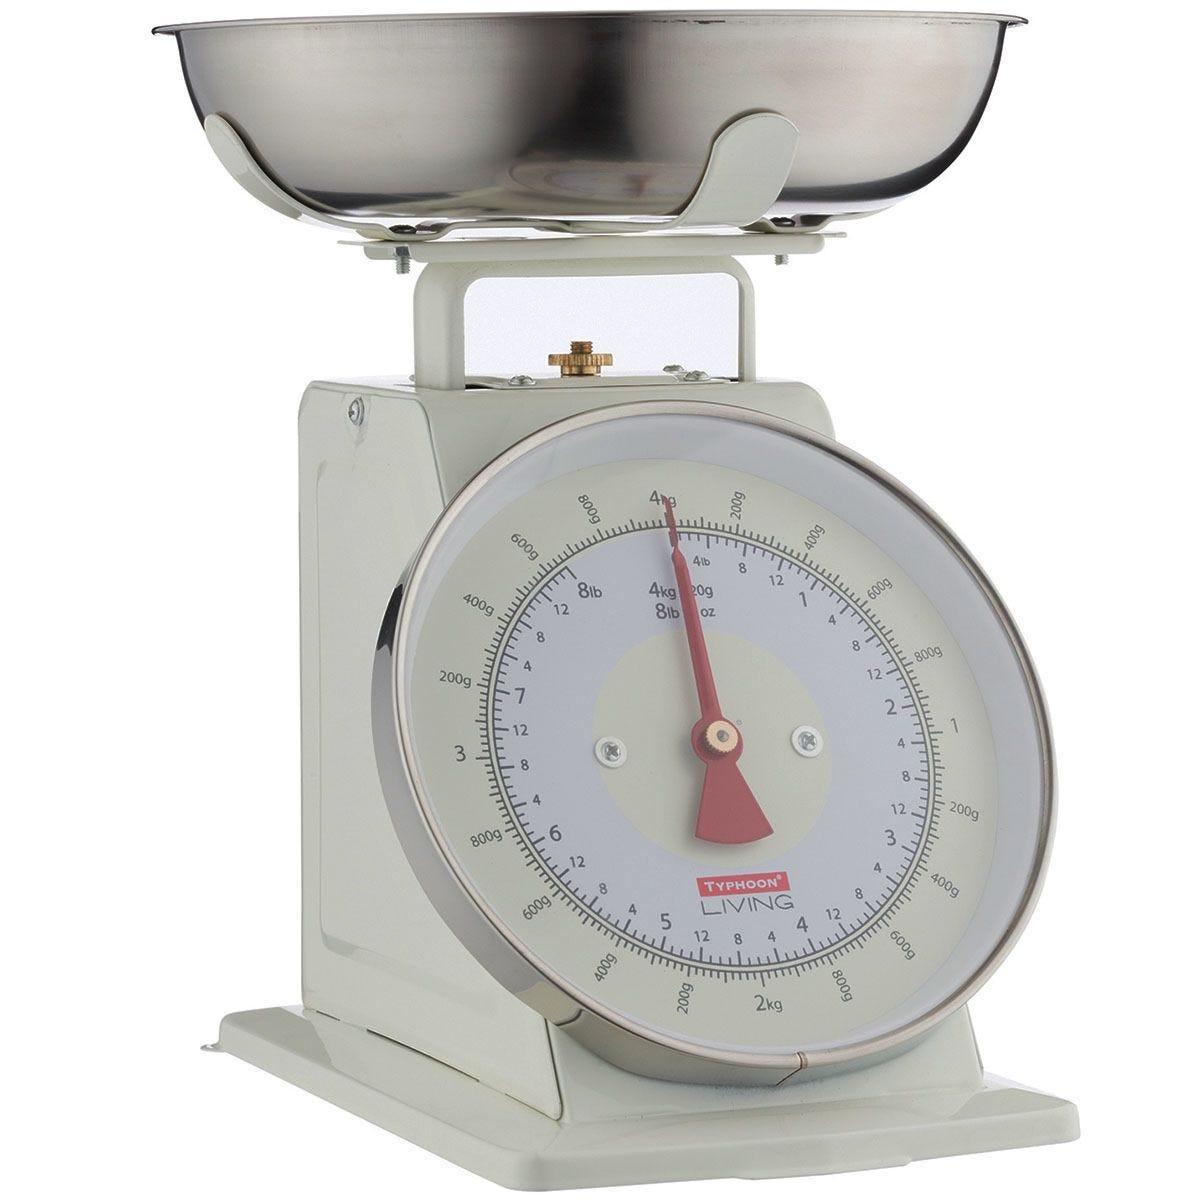 Typhoon Living Mechanical Kitchen Scales - Cream